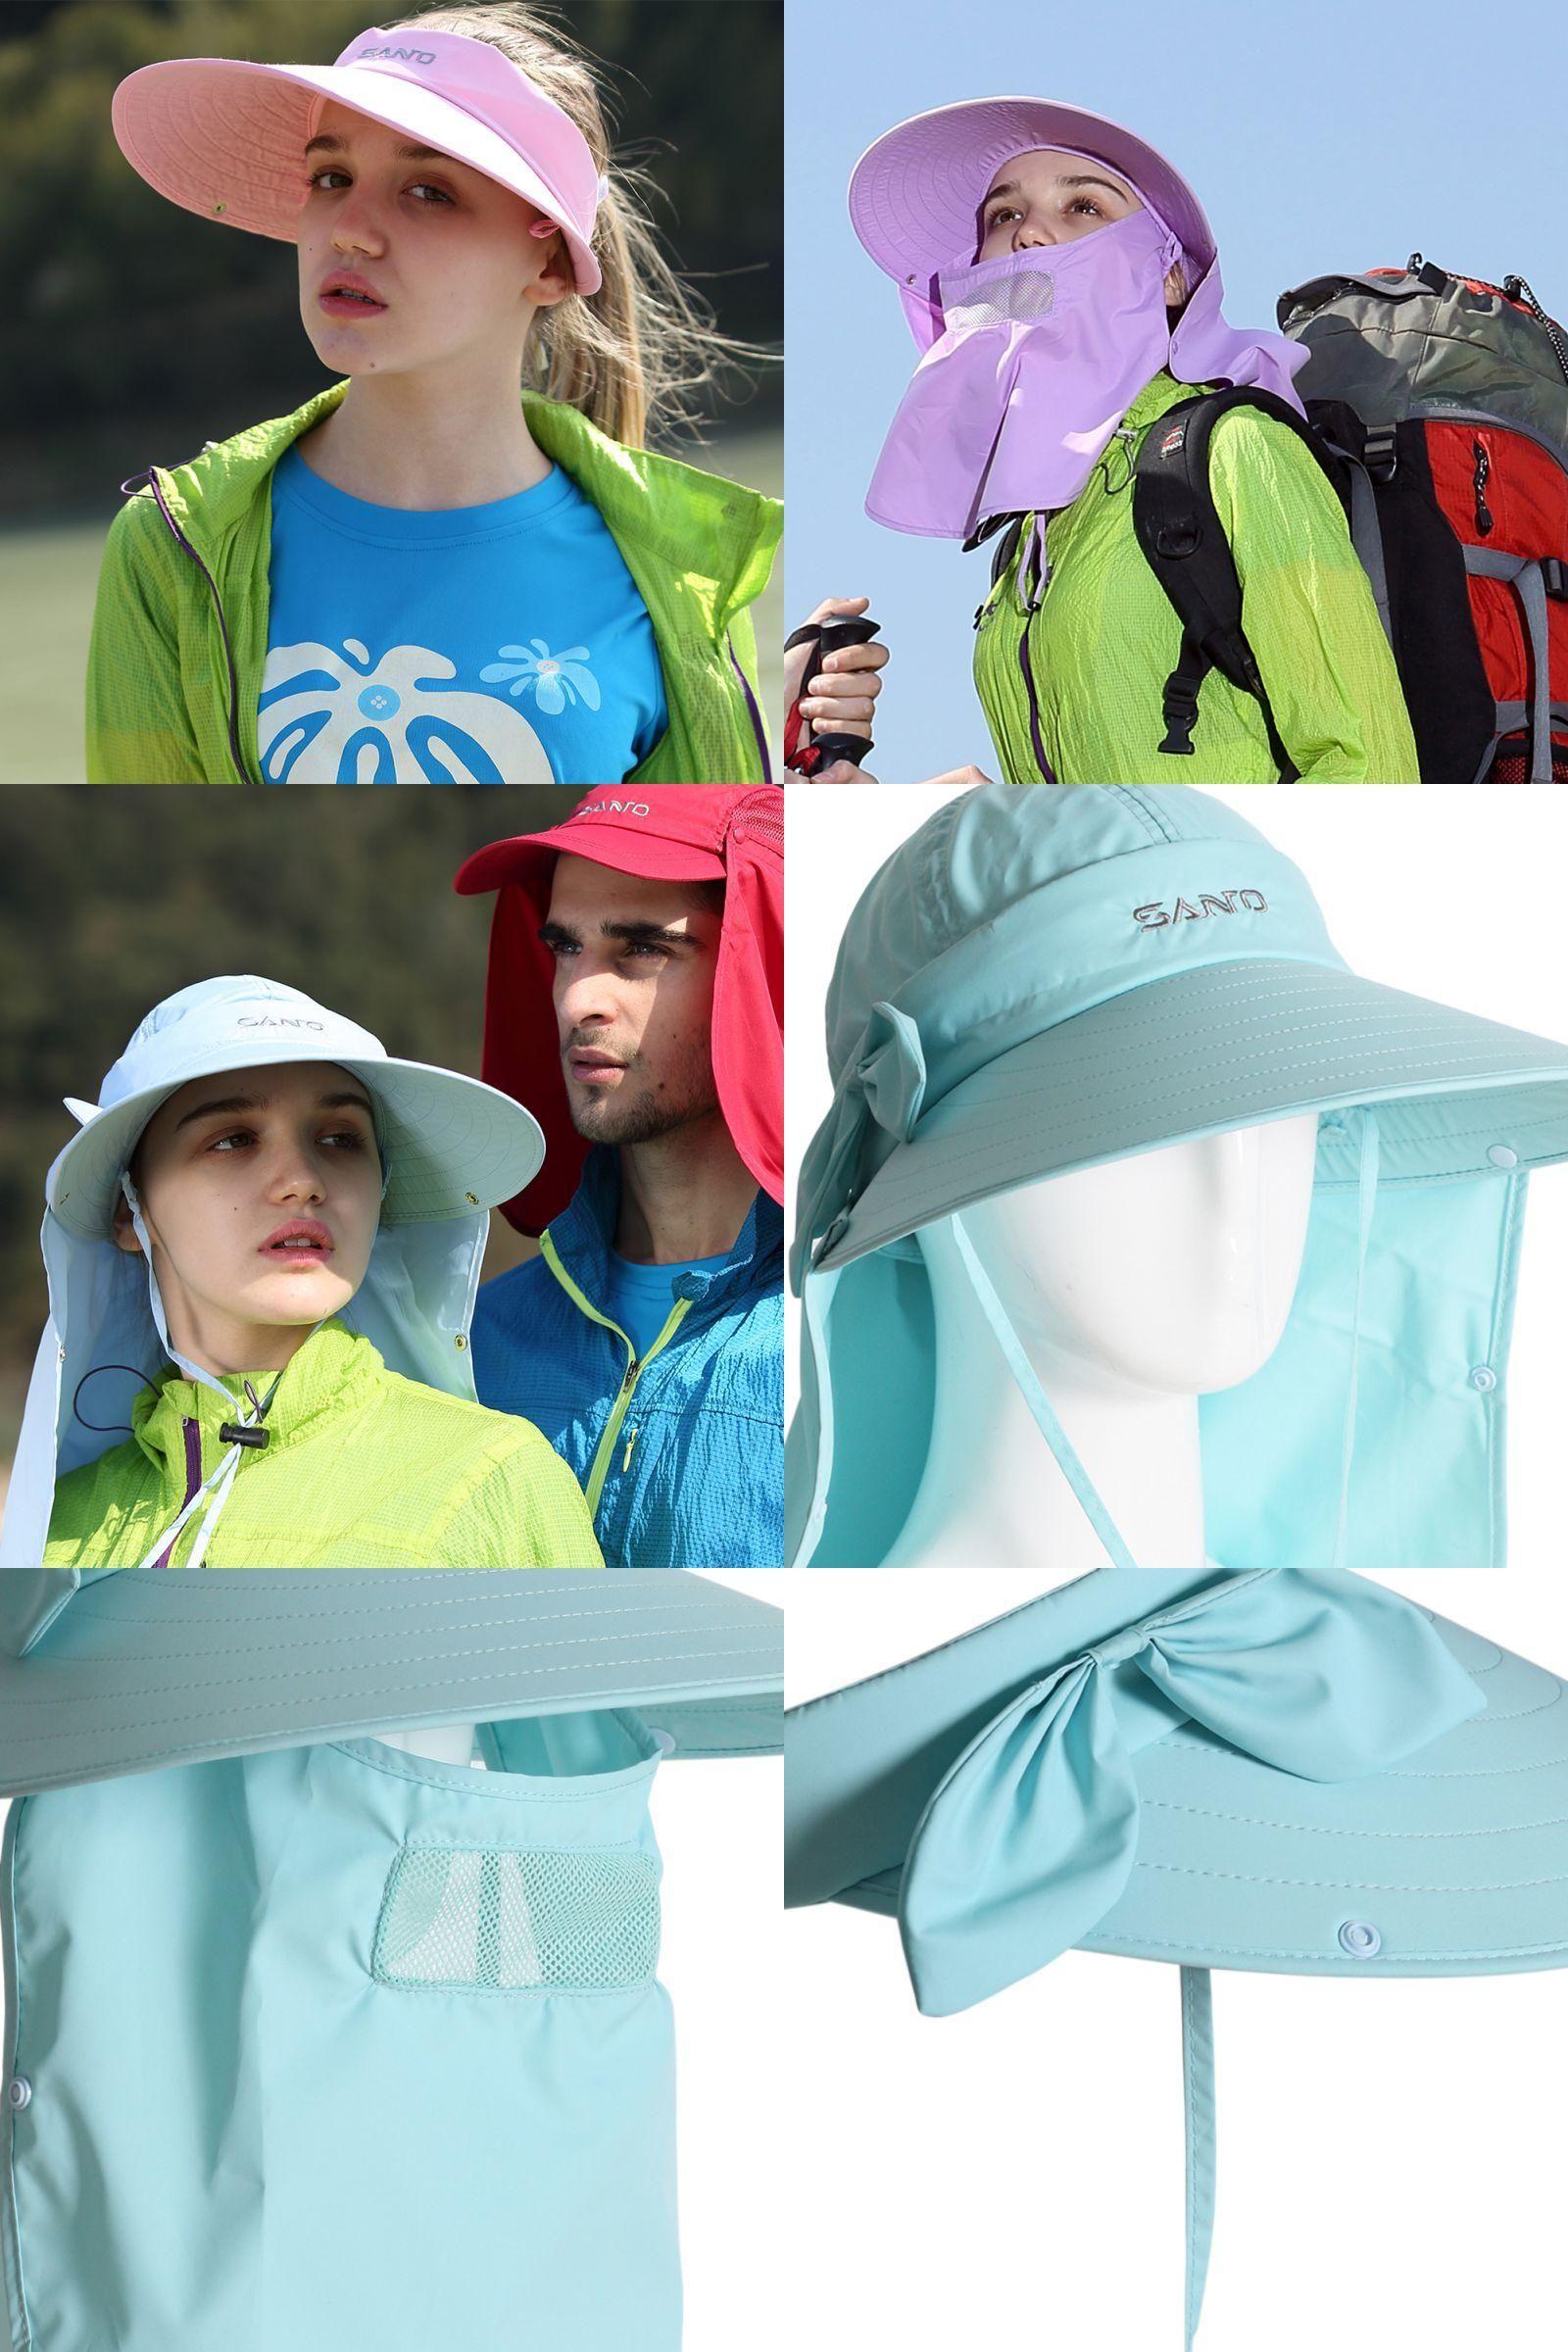 727cef97187  Visit to Buy  Bush Hats Wide Brim Sun Caps Outdoor Cap Hiking Camping Visor